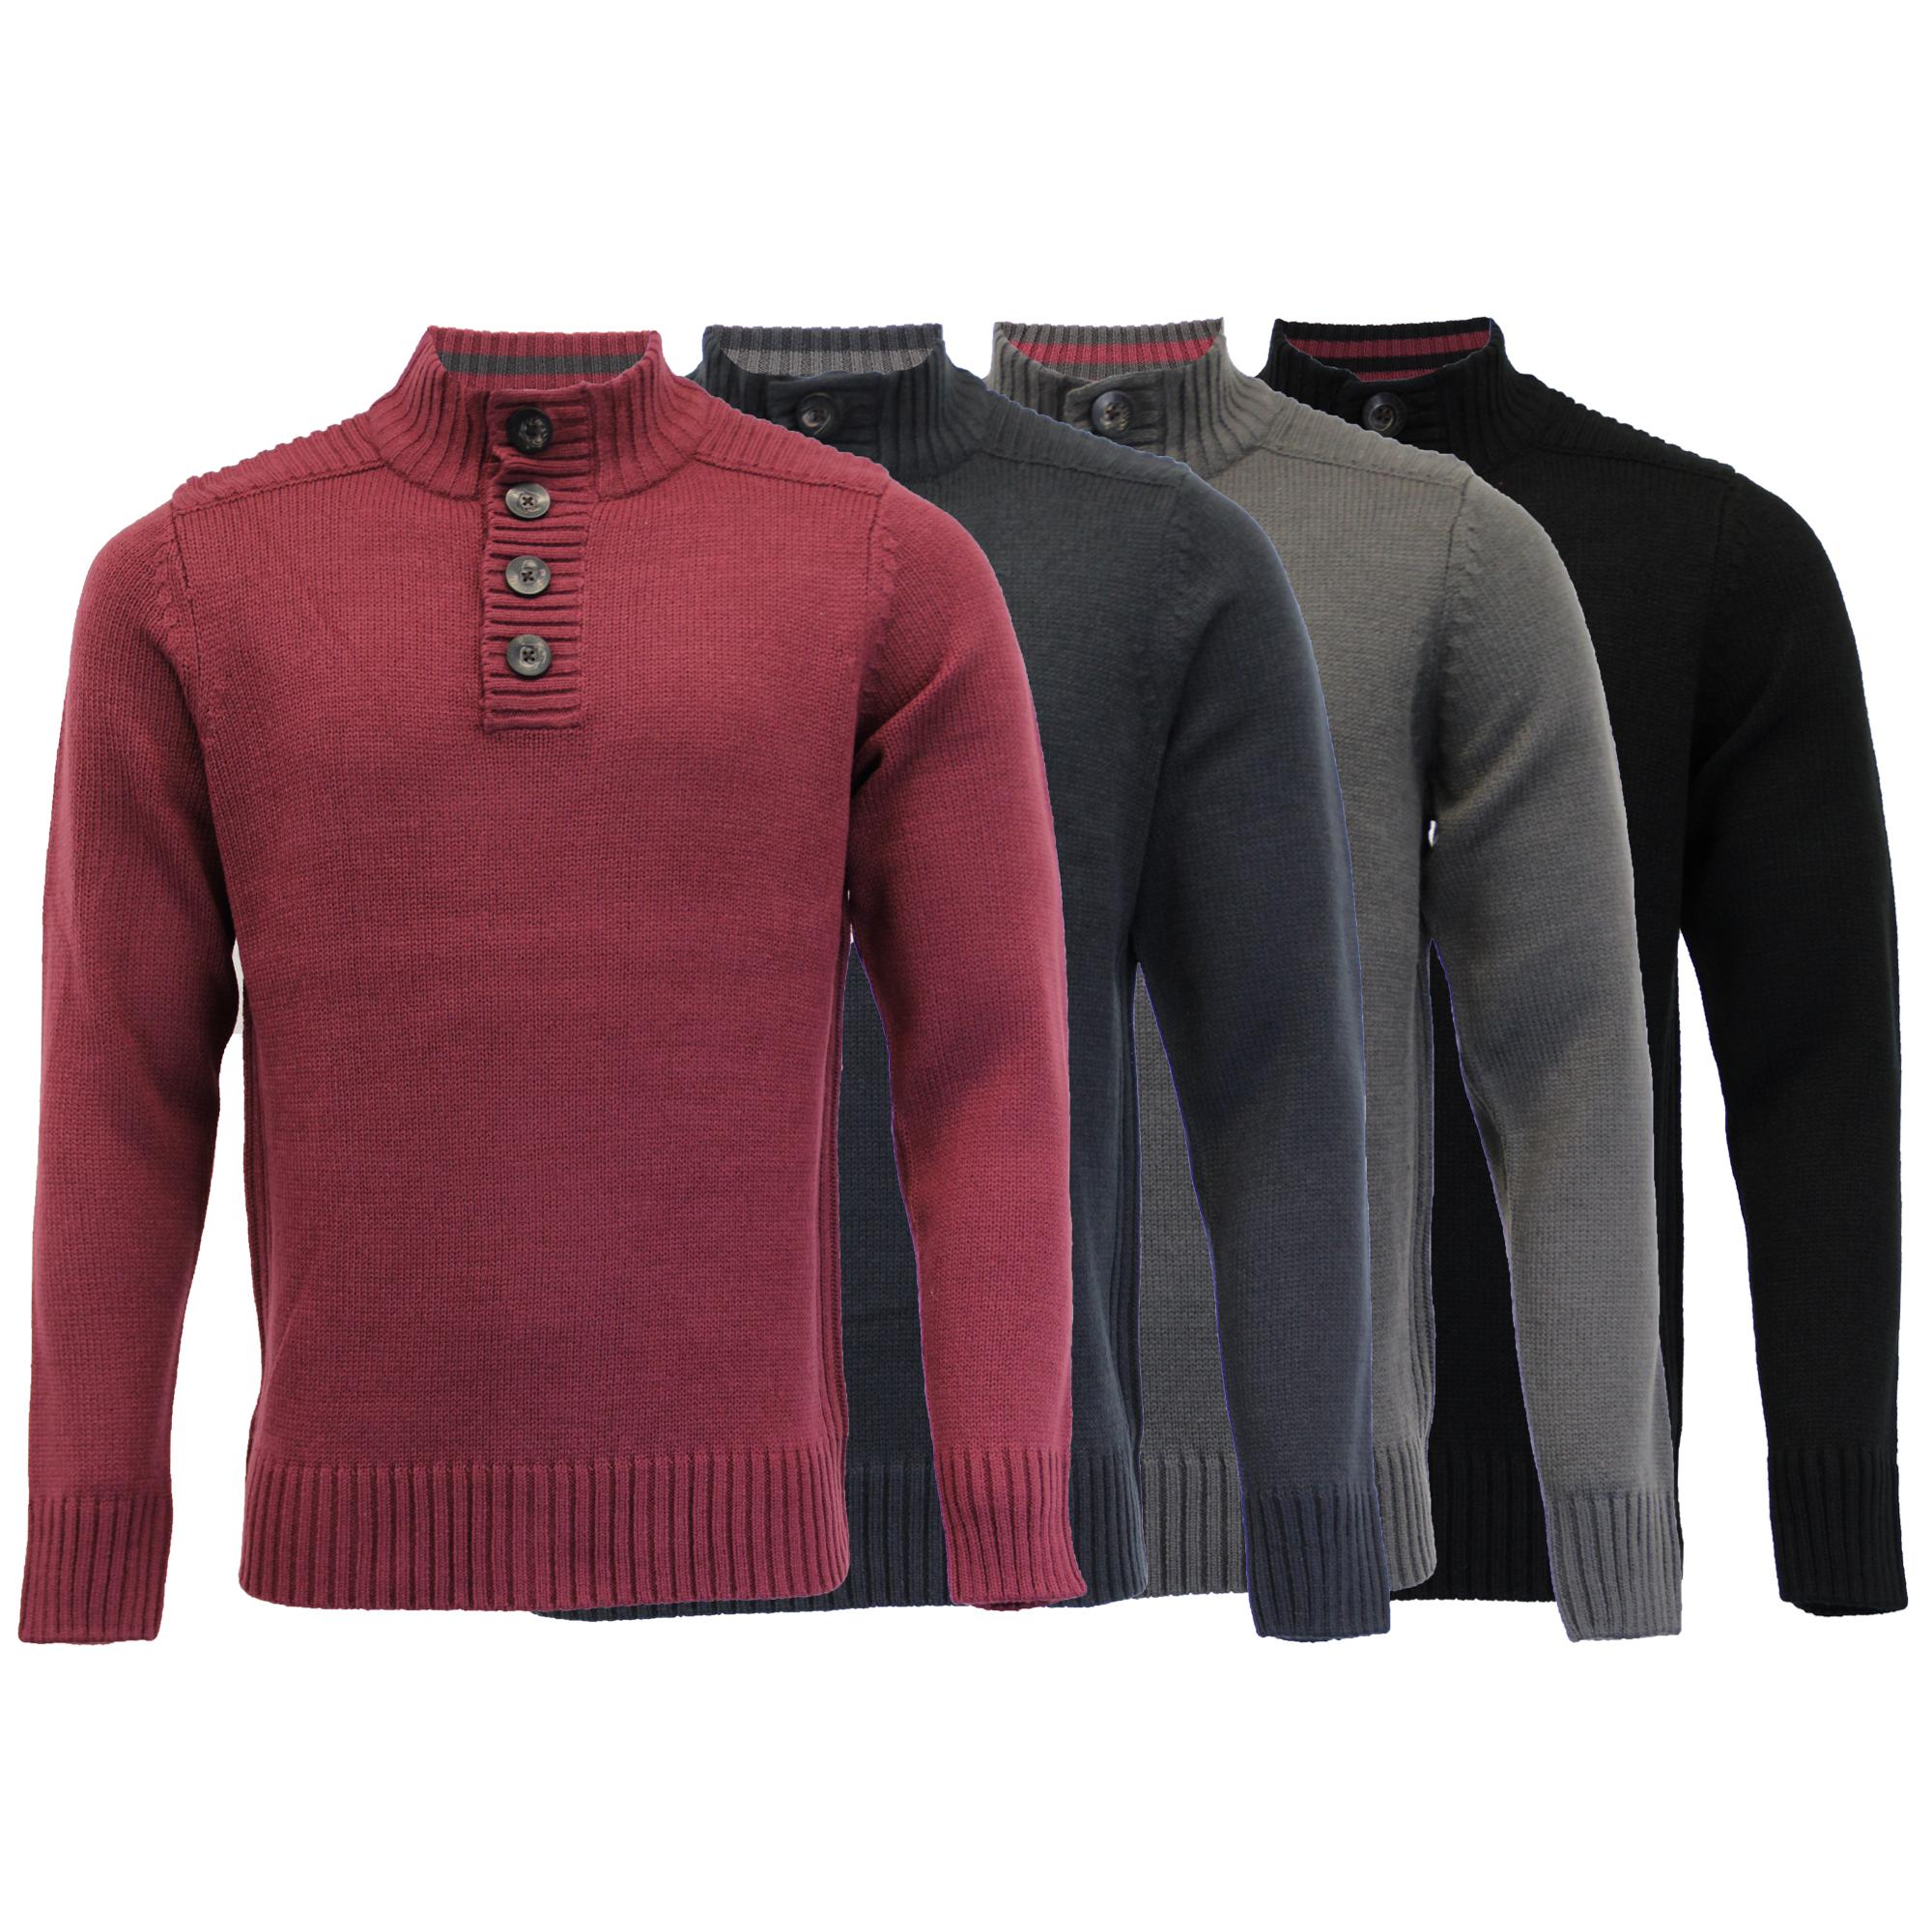 Mens-Knitted-Jumper-Kensington-Eastside-Sweater-Pullover-Top-Funnel-Neck-Winter thumbnail 3